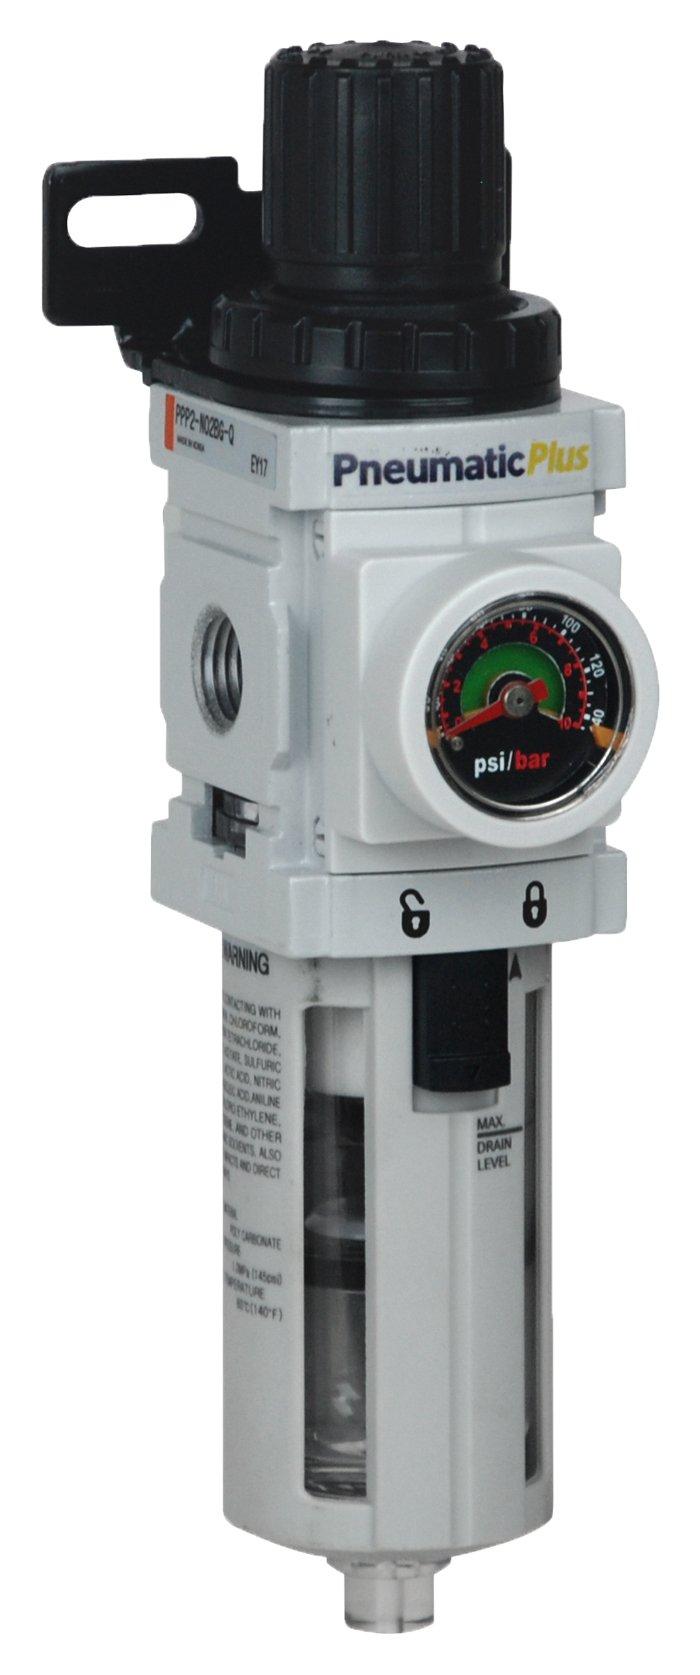 PneumaticPlus PPP2-N02BG Miniature Air Filter Regulator Piggyback Combo 1/4'' NPT - 5 Micron, Poly Bowl, Manual Drain, Embedded Gauge